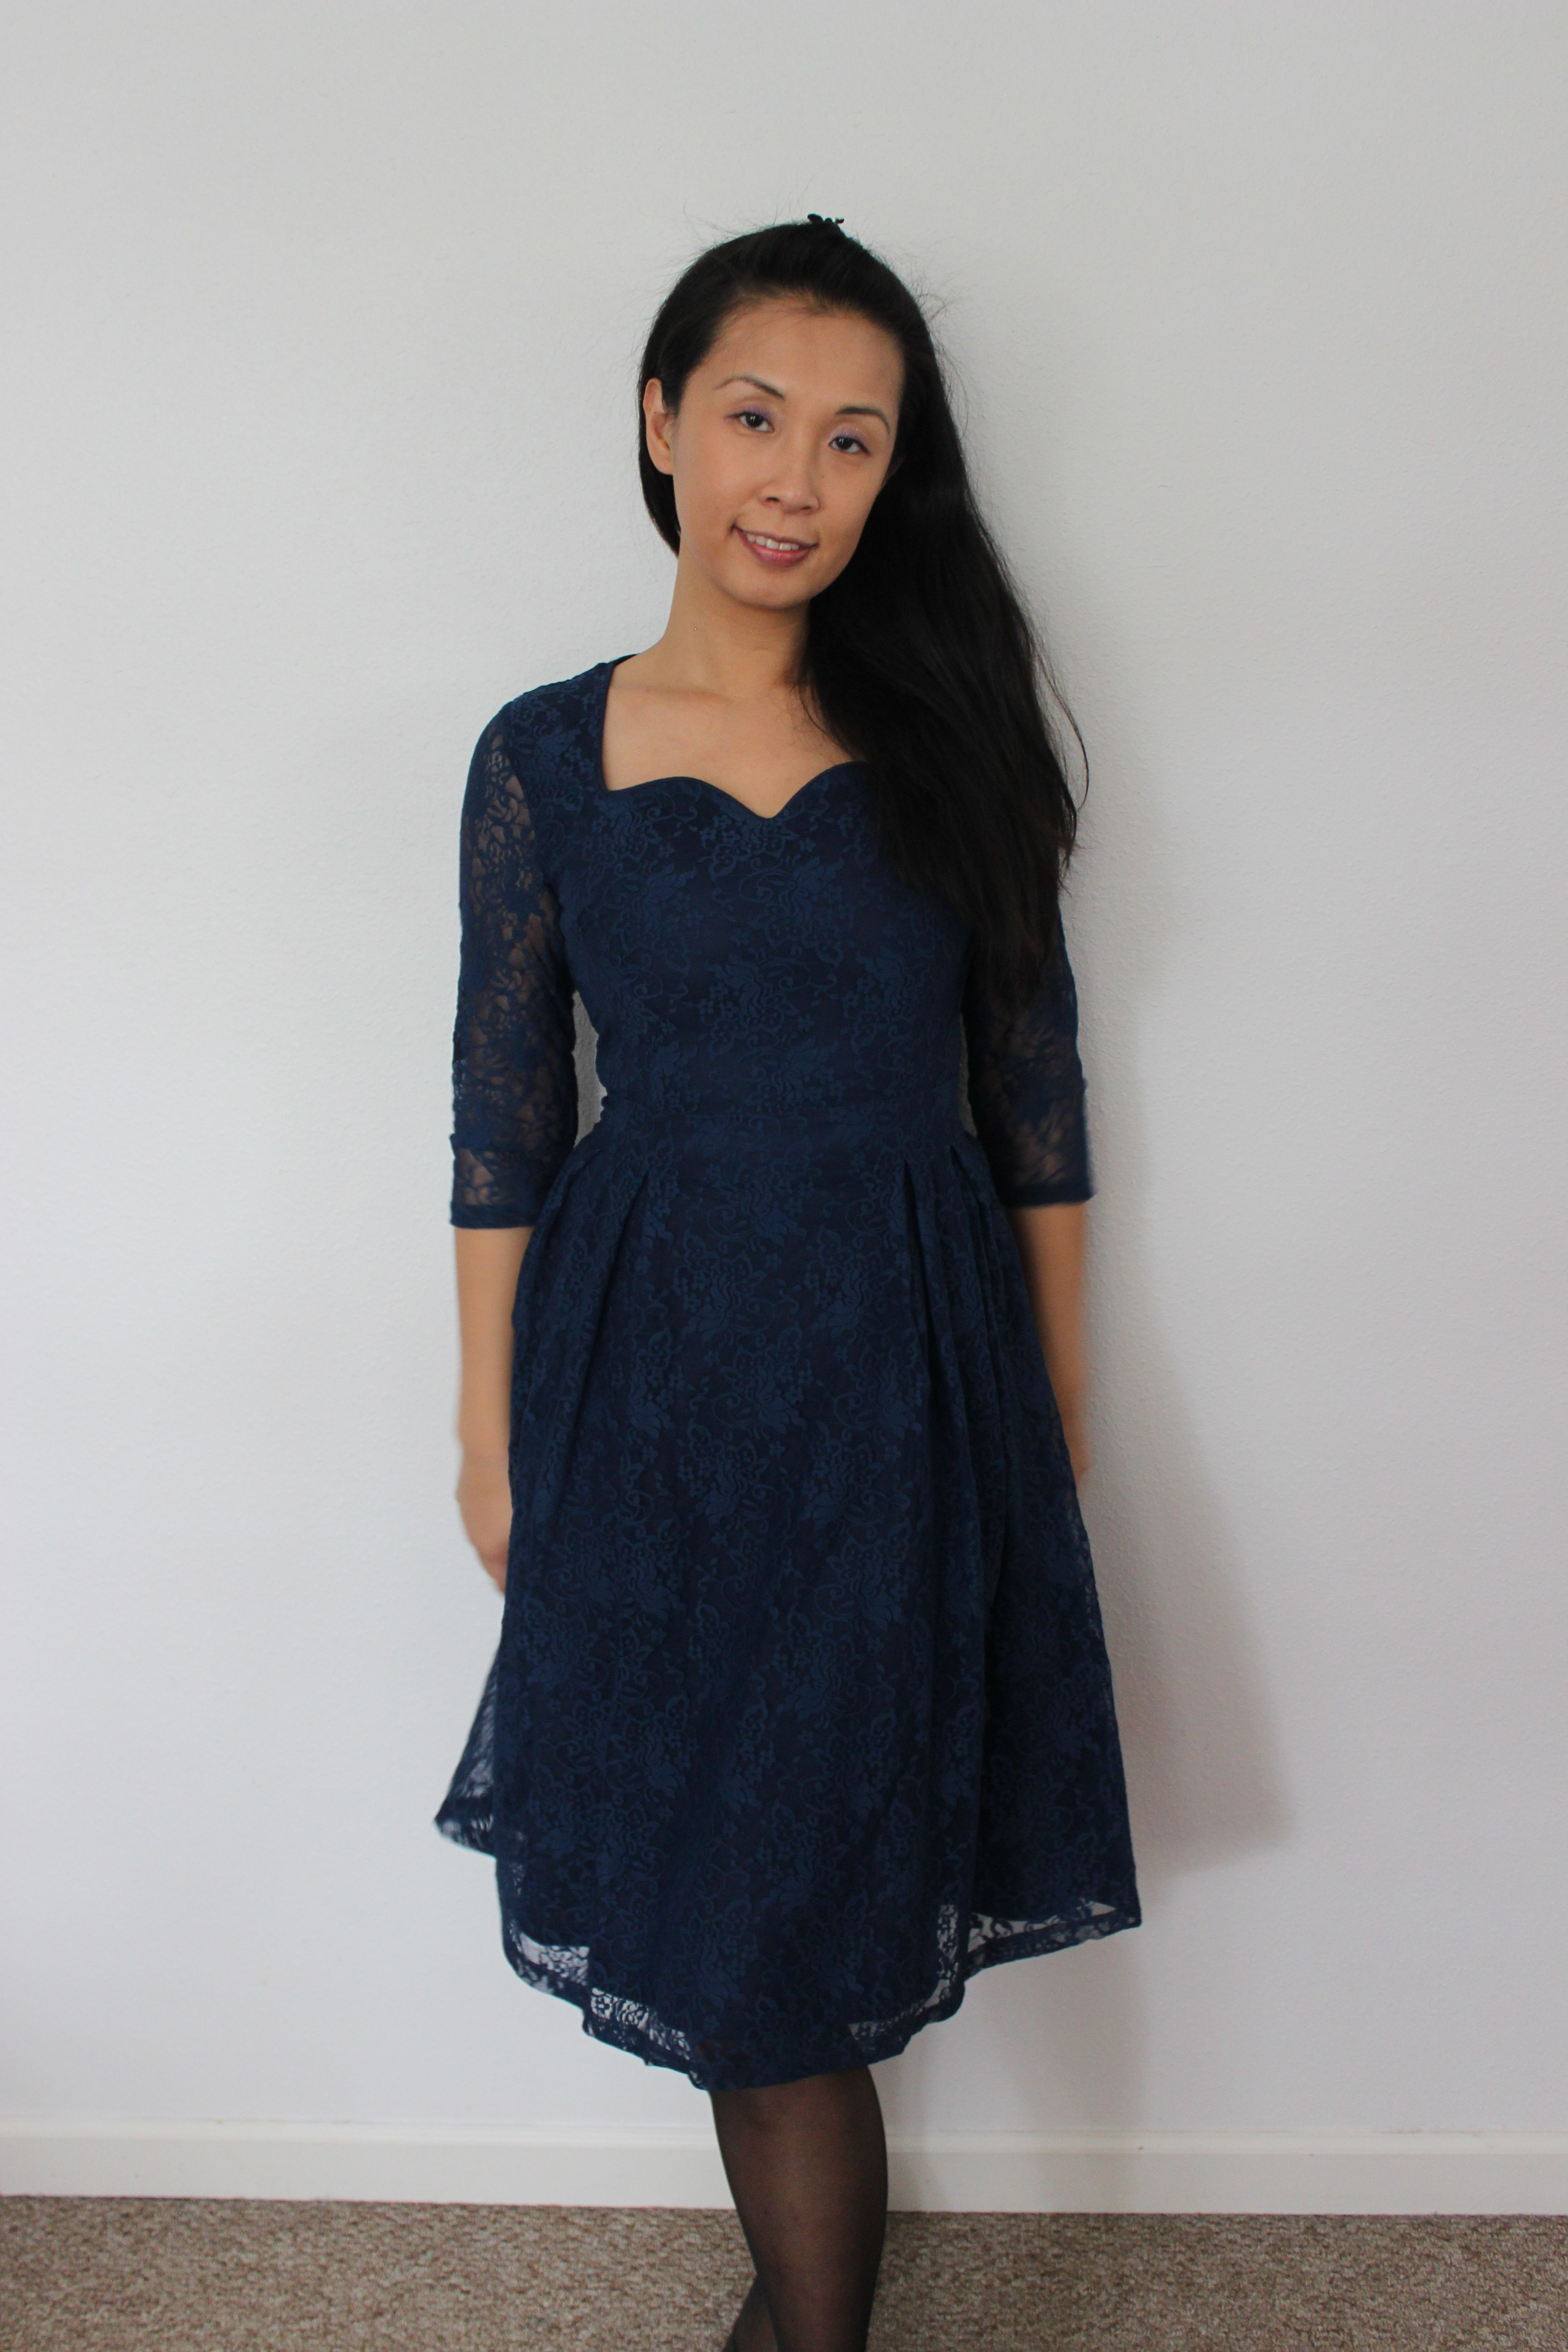 Lindy bop lisette 39 exquisitely elegant deep blue lace for Lindy bop wedding dress